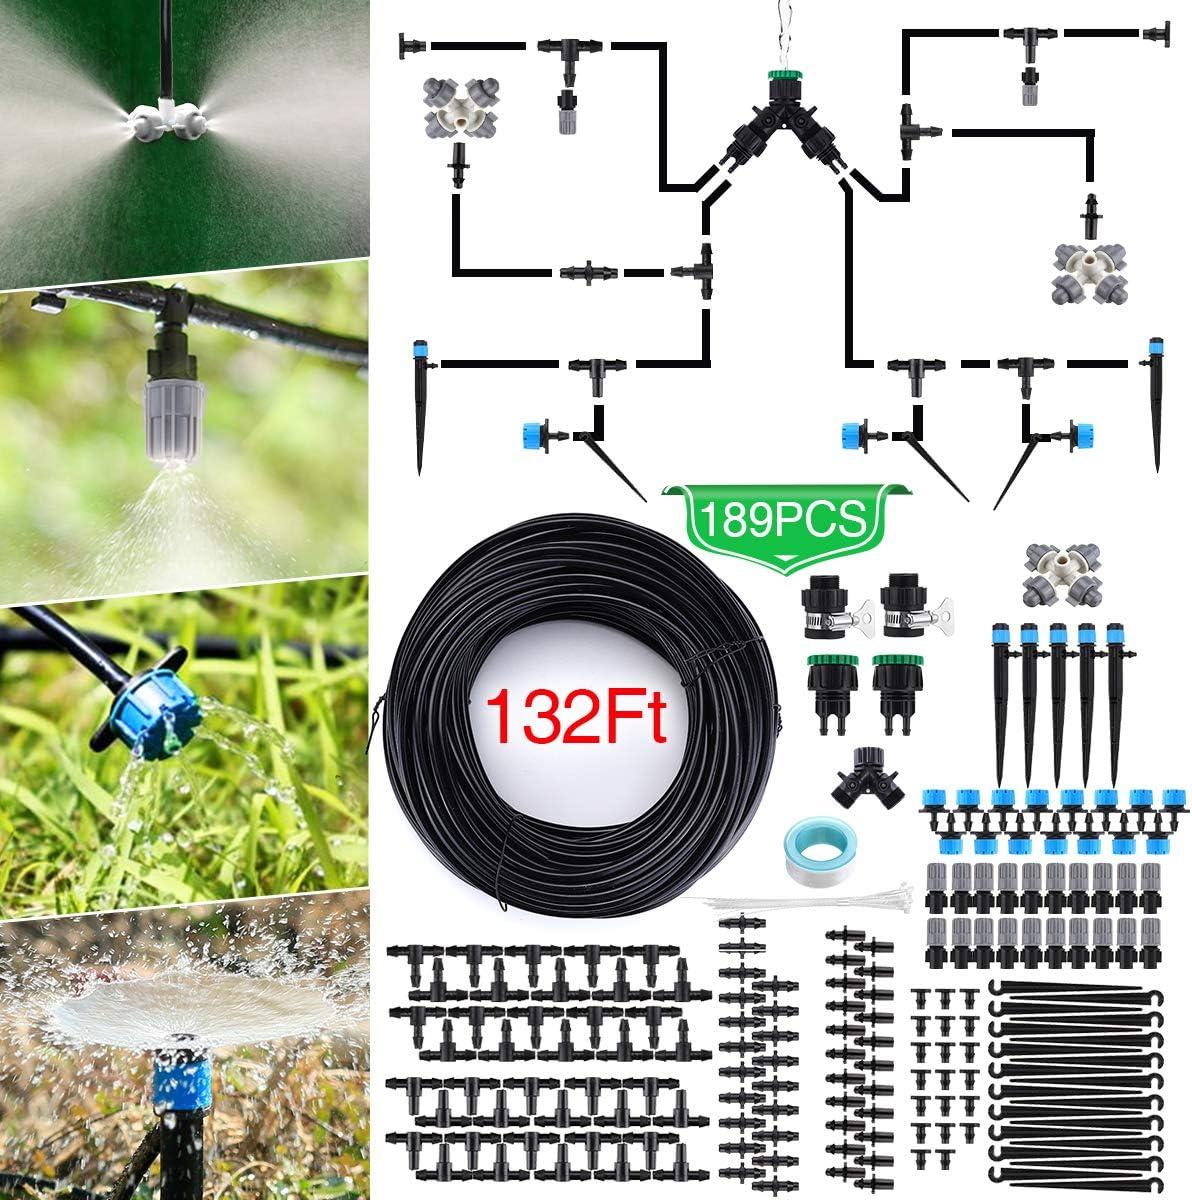 Jeteven 40M Sistema de Riego de Jardín, 189Pcs Kit Riego Goteo, Sistema de Riego Automatico por Goteo, para Jardines, Macizo de Flores, Plantas de Jardín